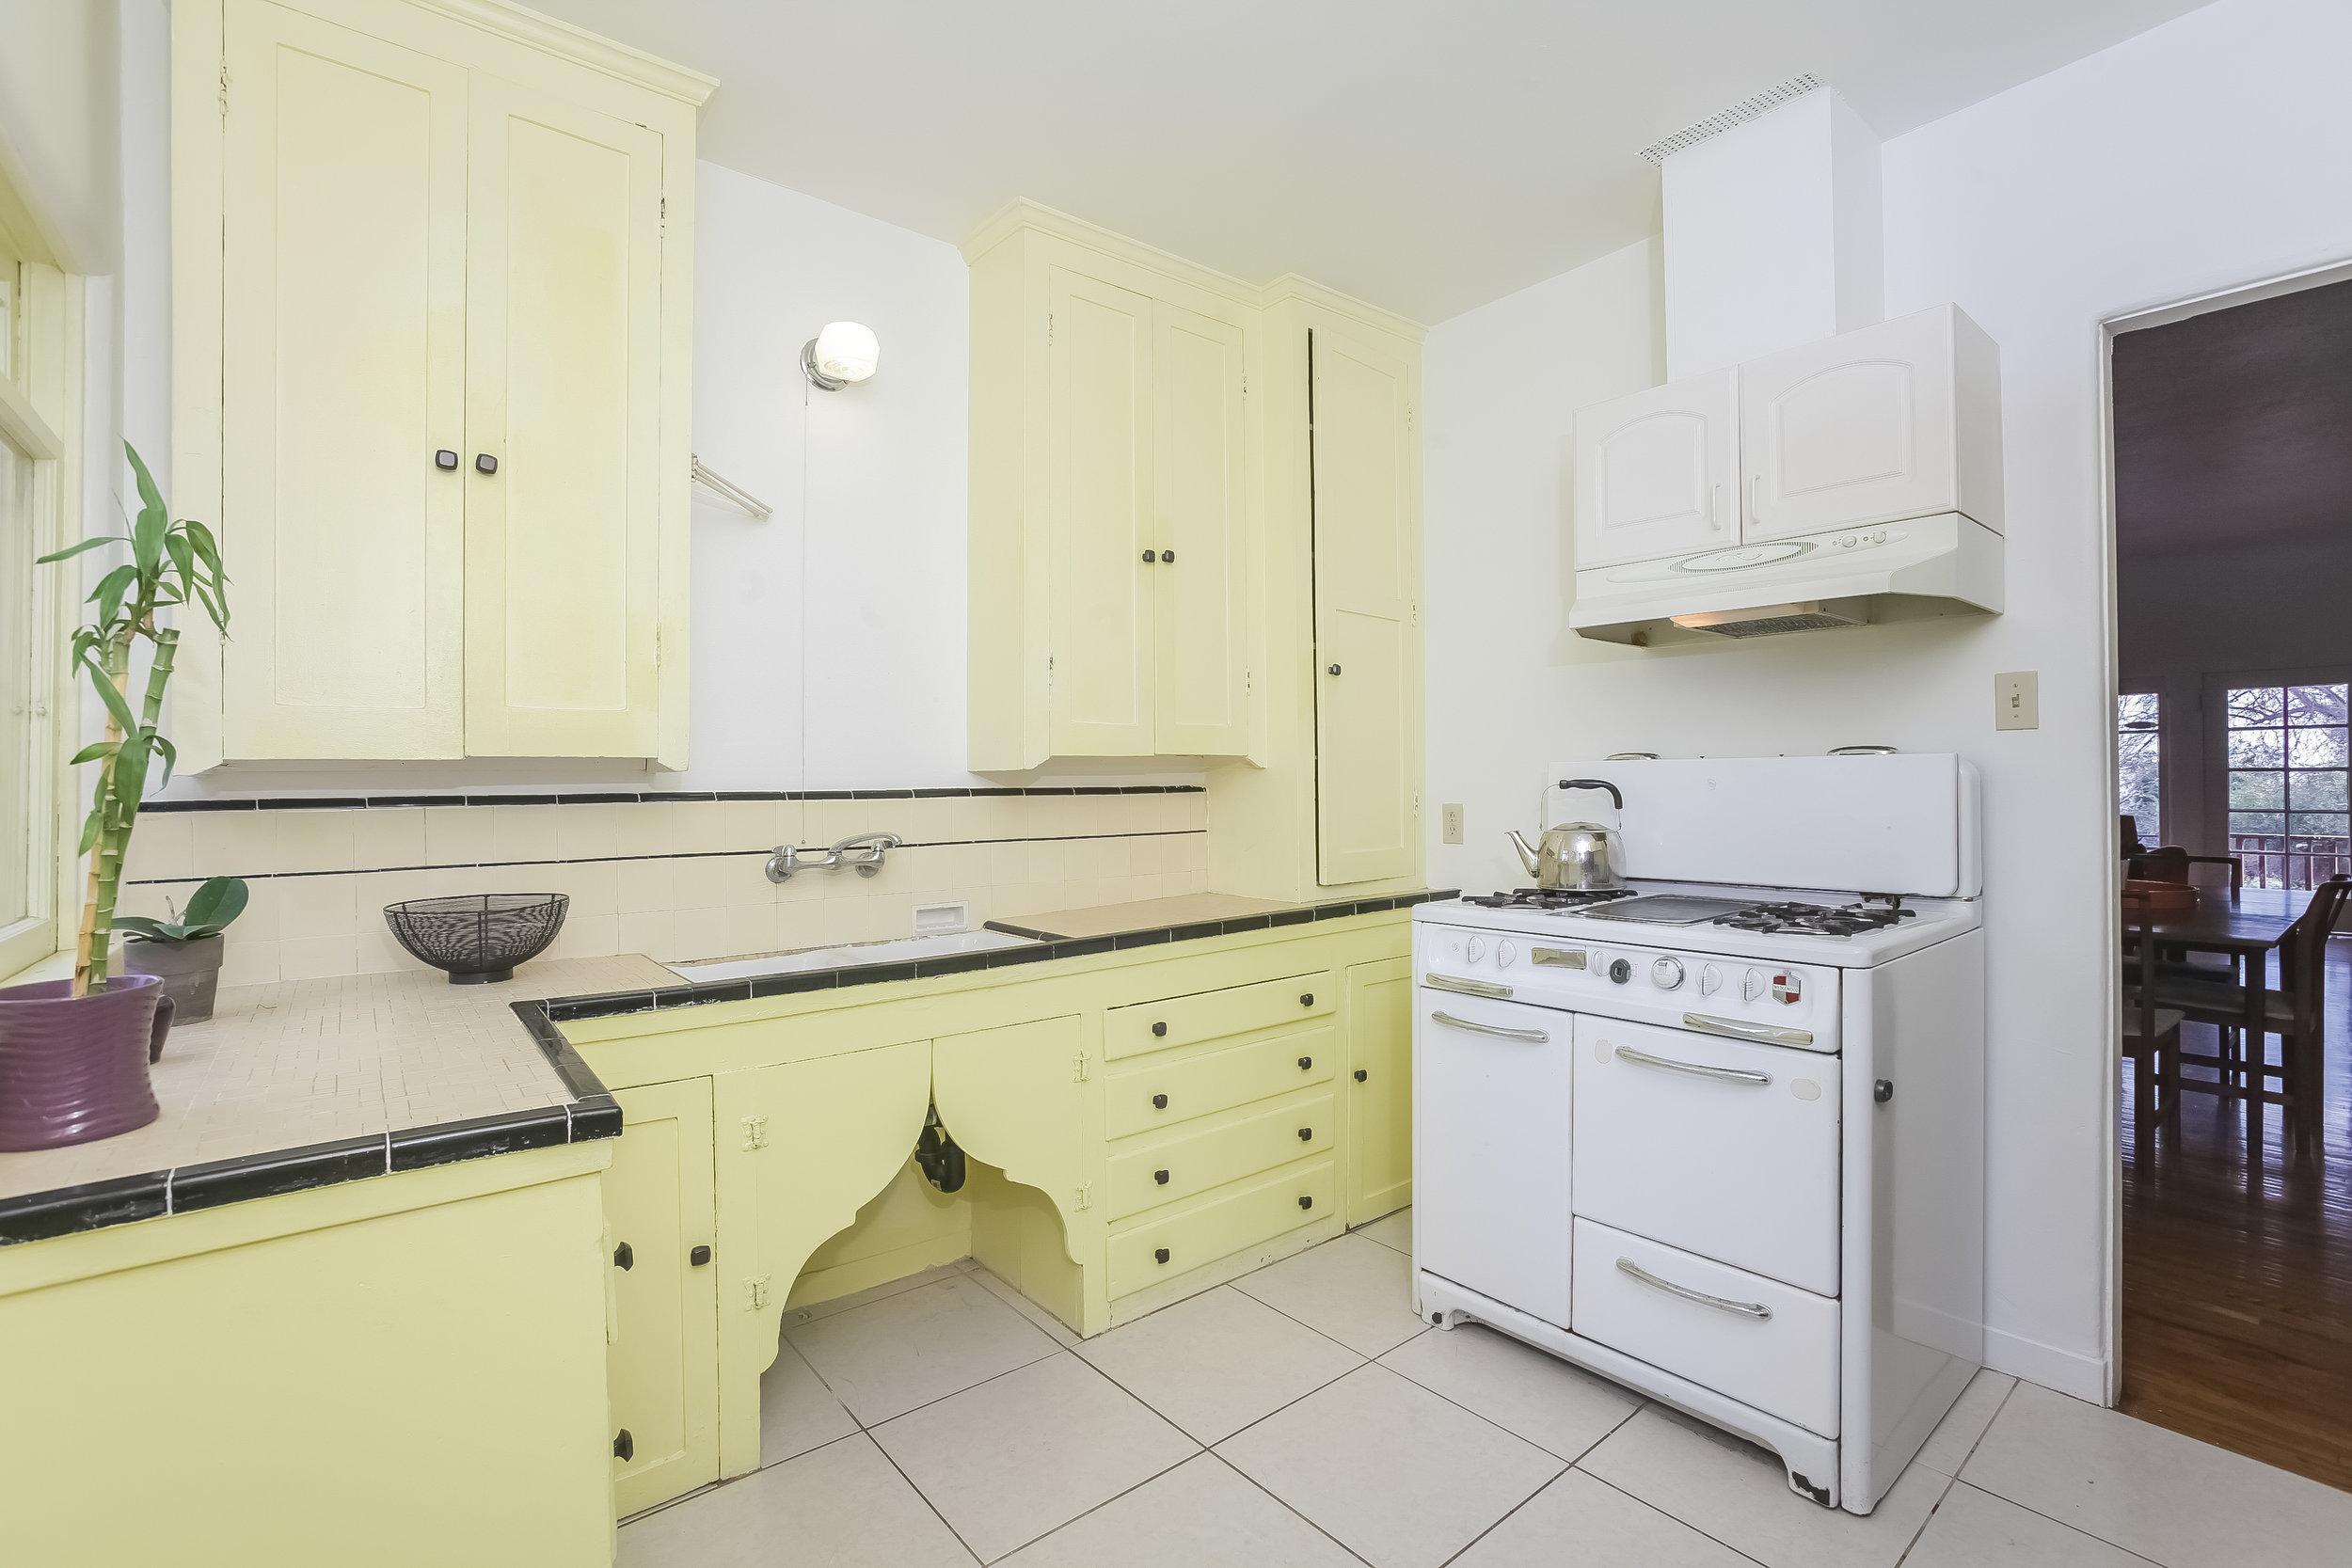 010-Kitchen-4517254-large.jpg